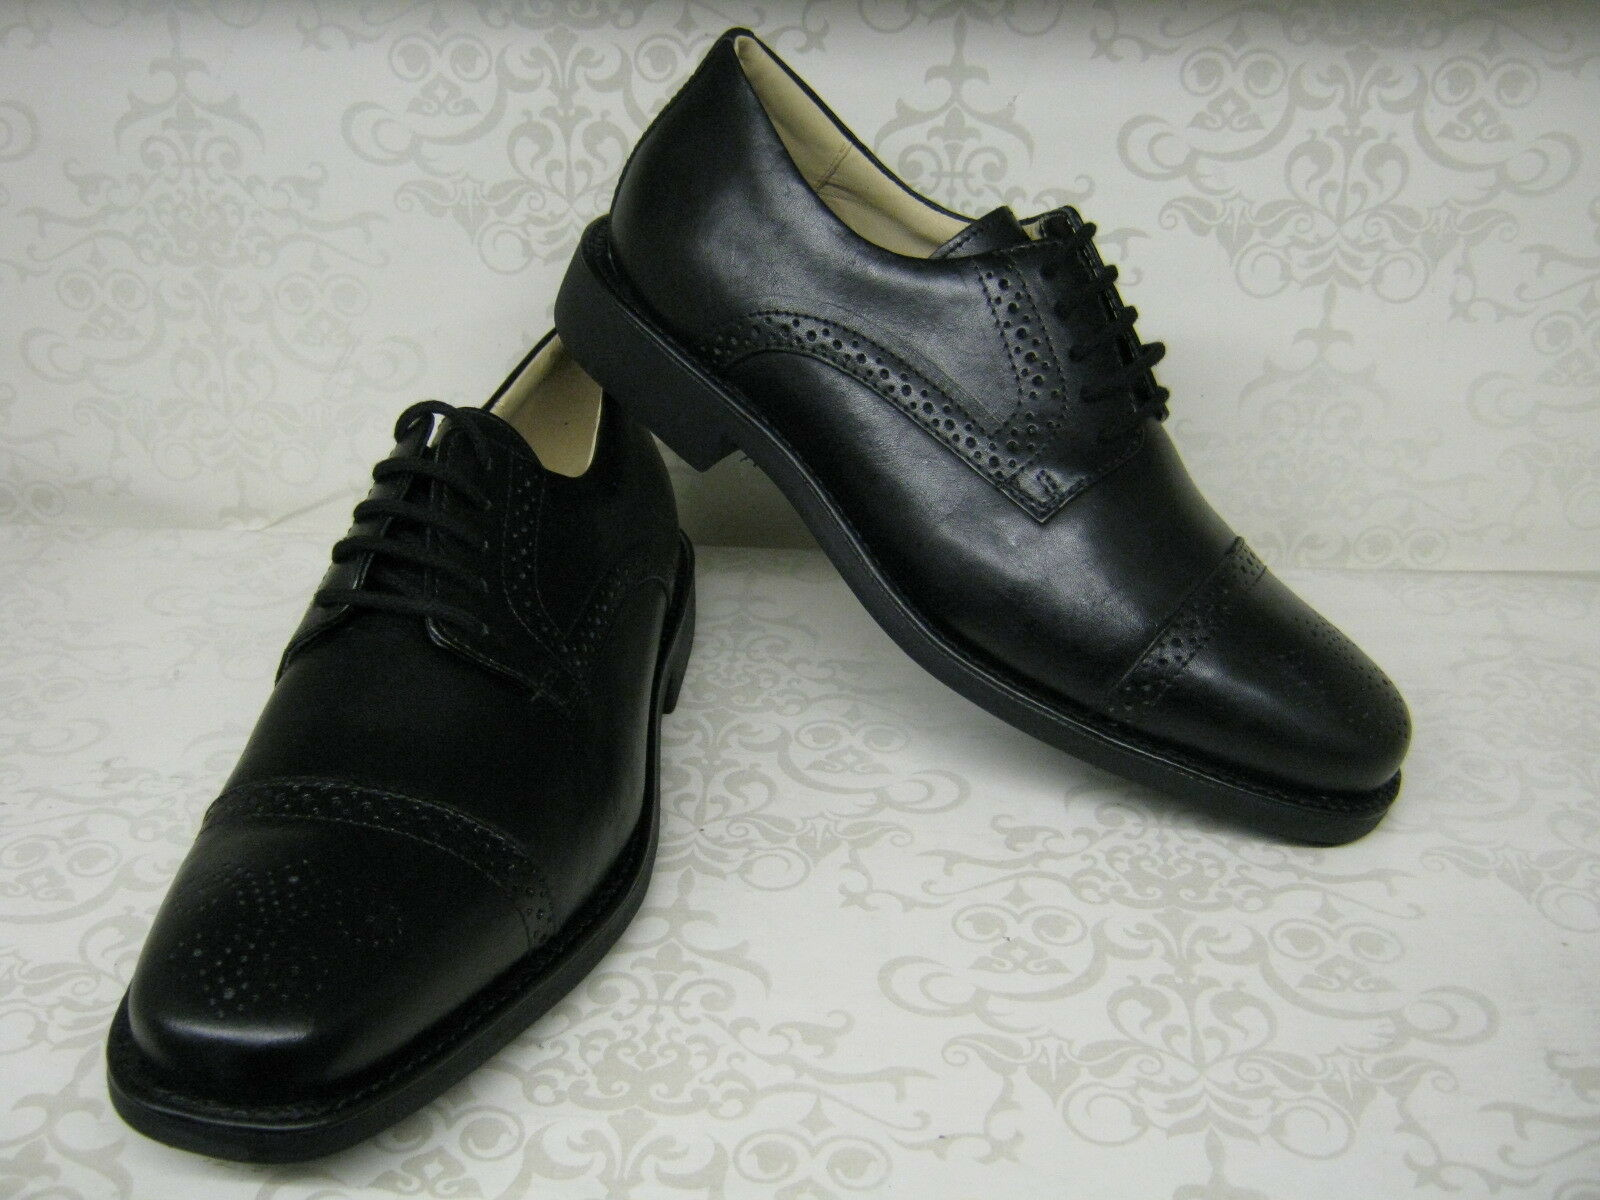 Anatomic & Co Araras Black Leather Smart Lace Up Brogue Style Shoes